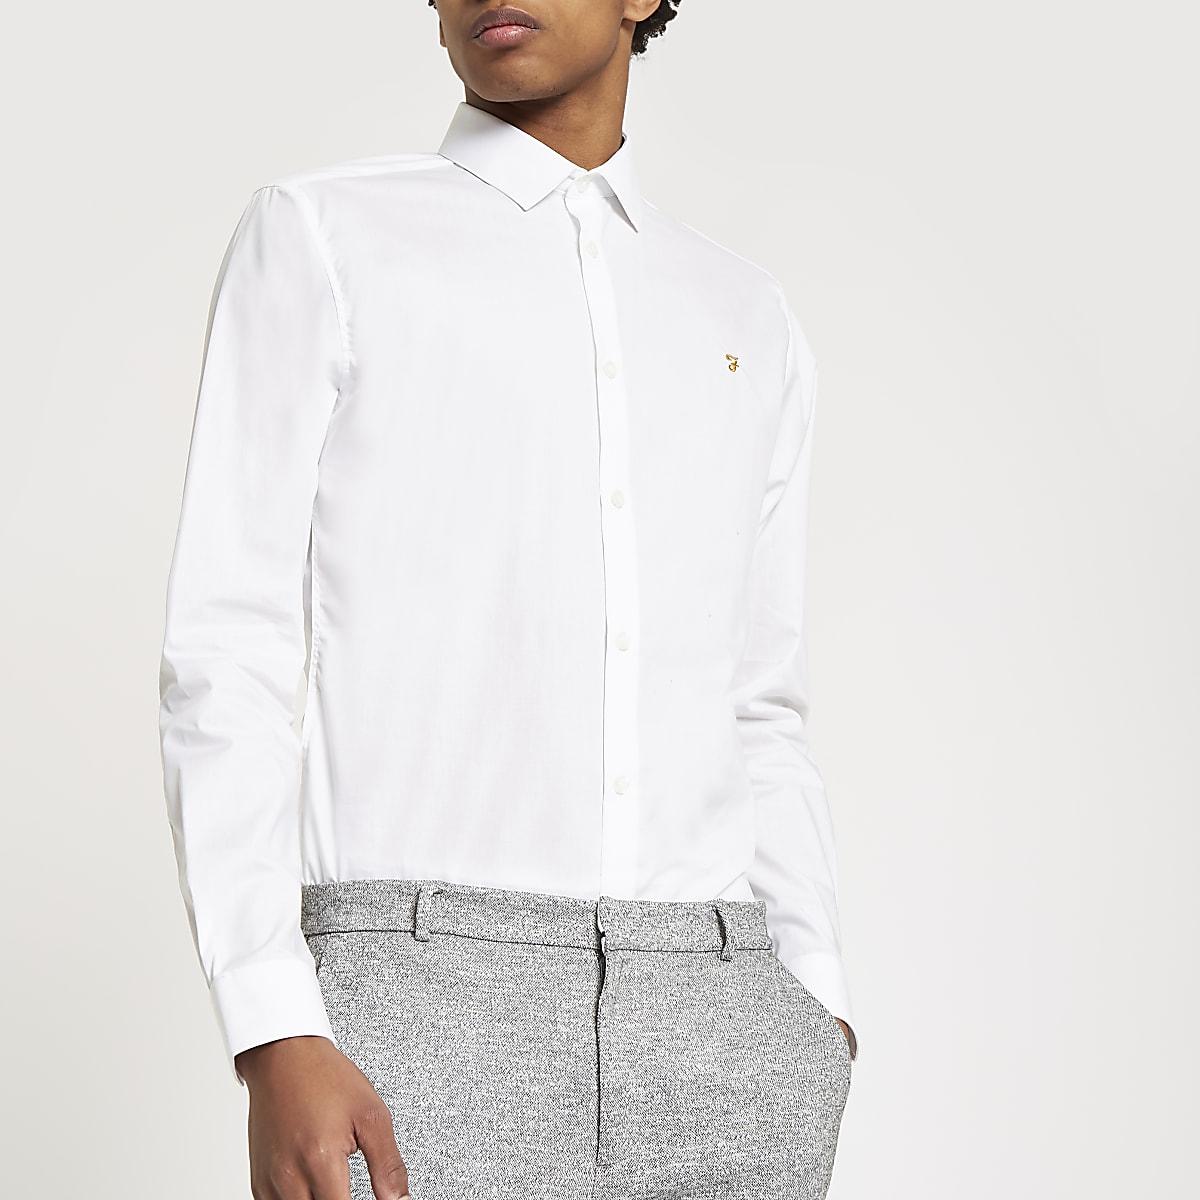 Farah – Langärmeliges Regular Fit Hemd in Weiß